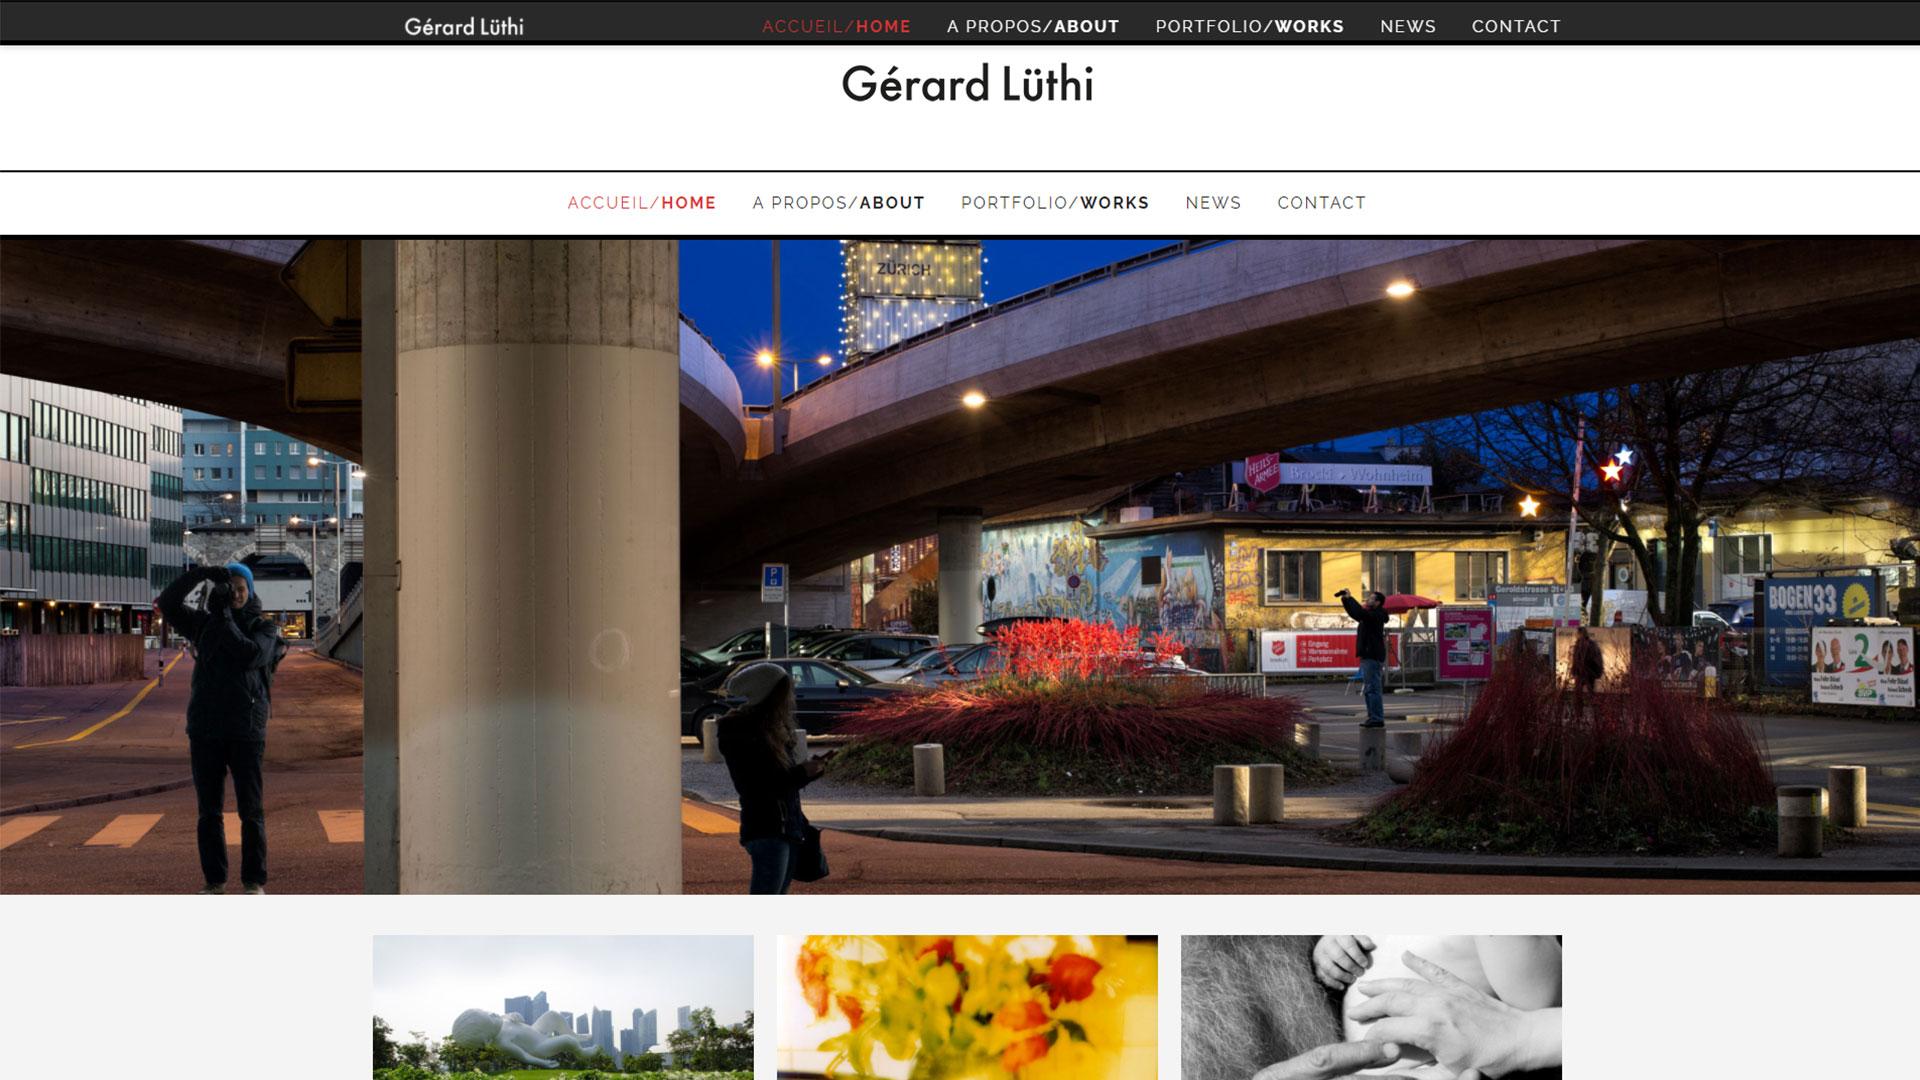 accueil-gerard-luthi